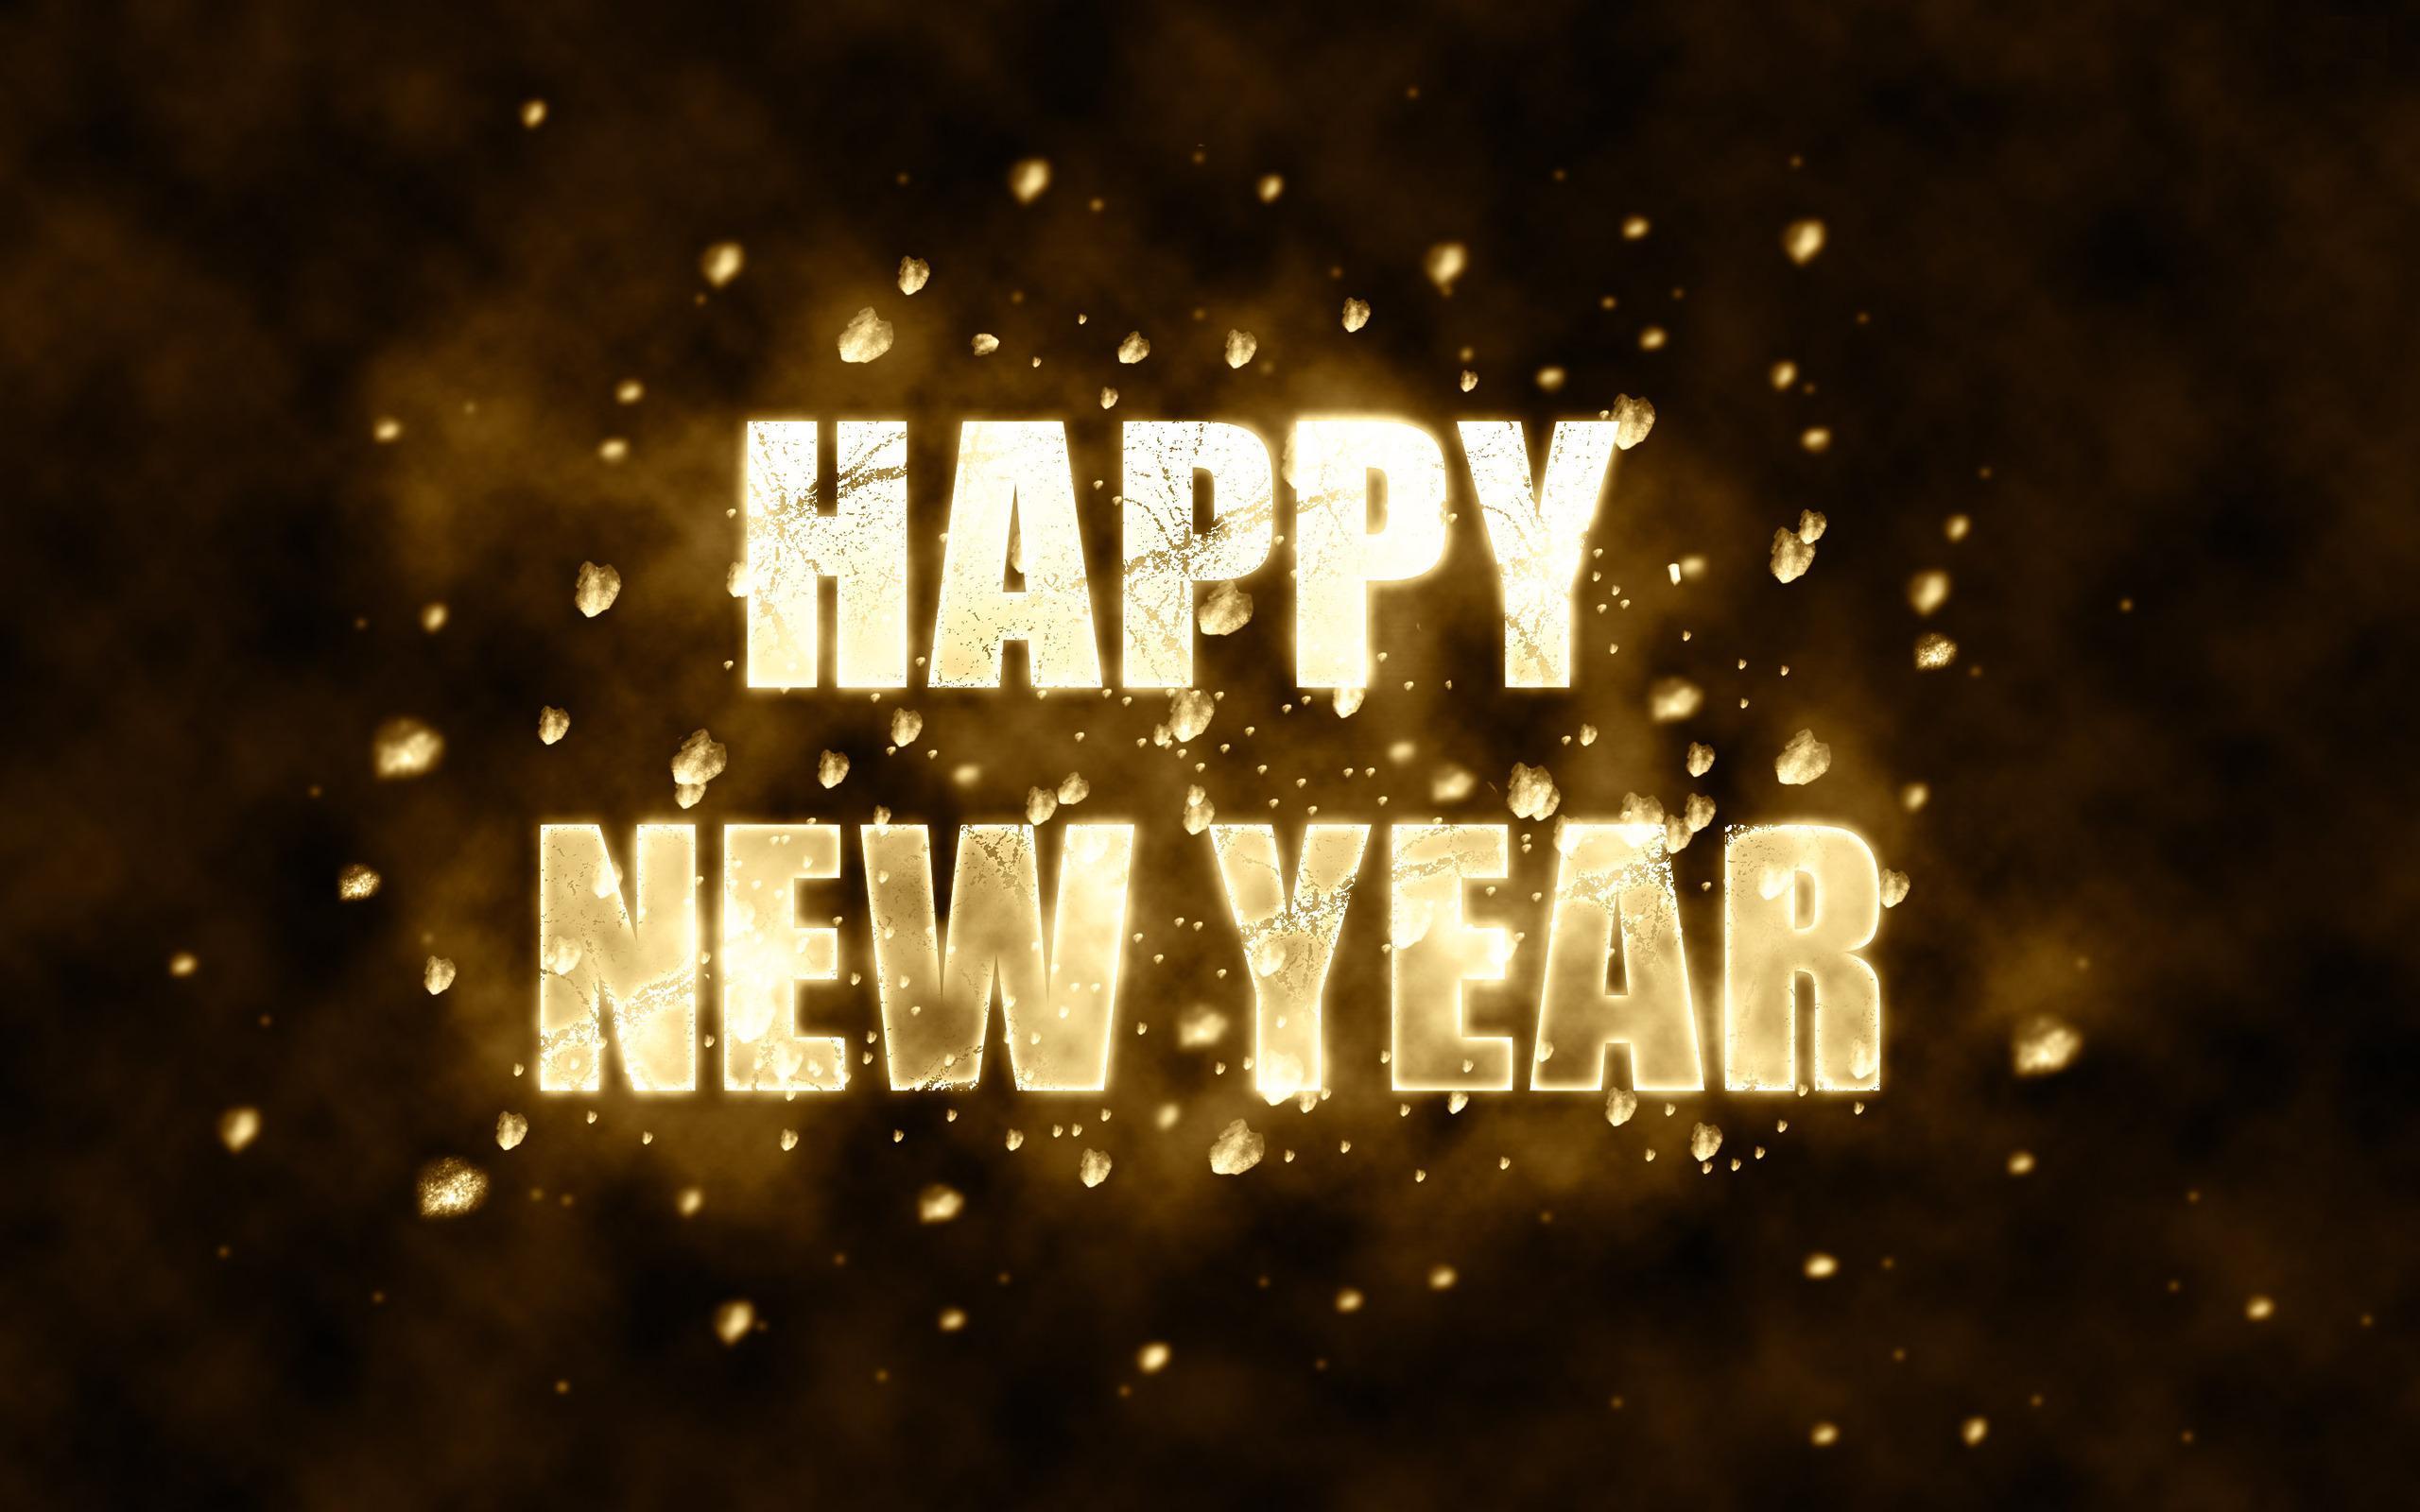 Happy New Year Wallpaper Screensaver HD